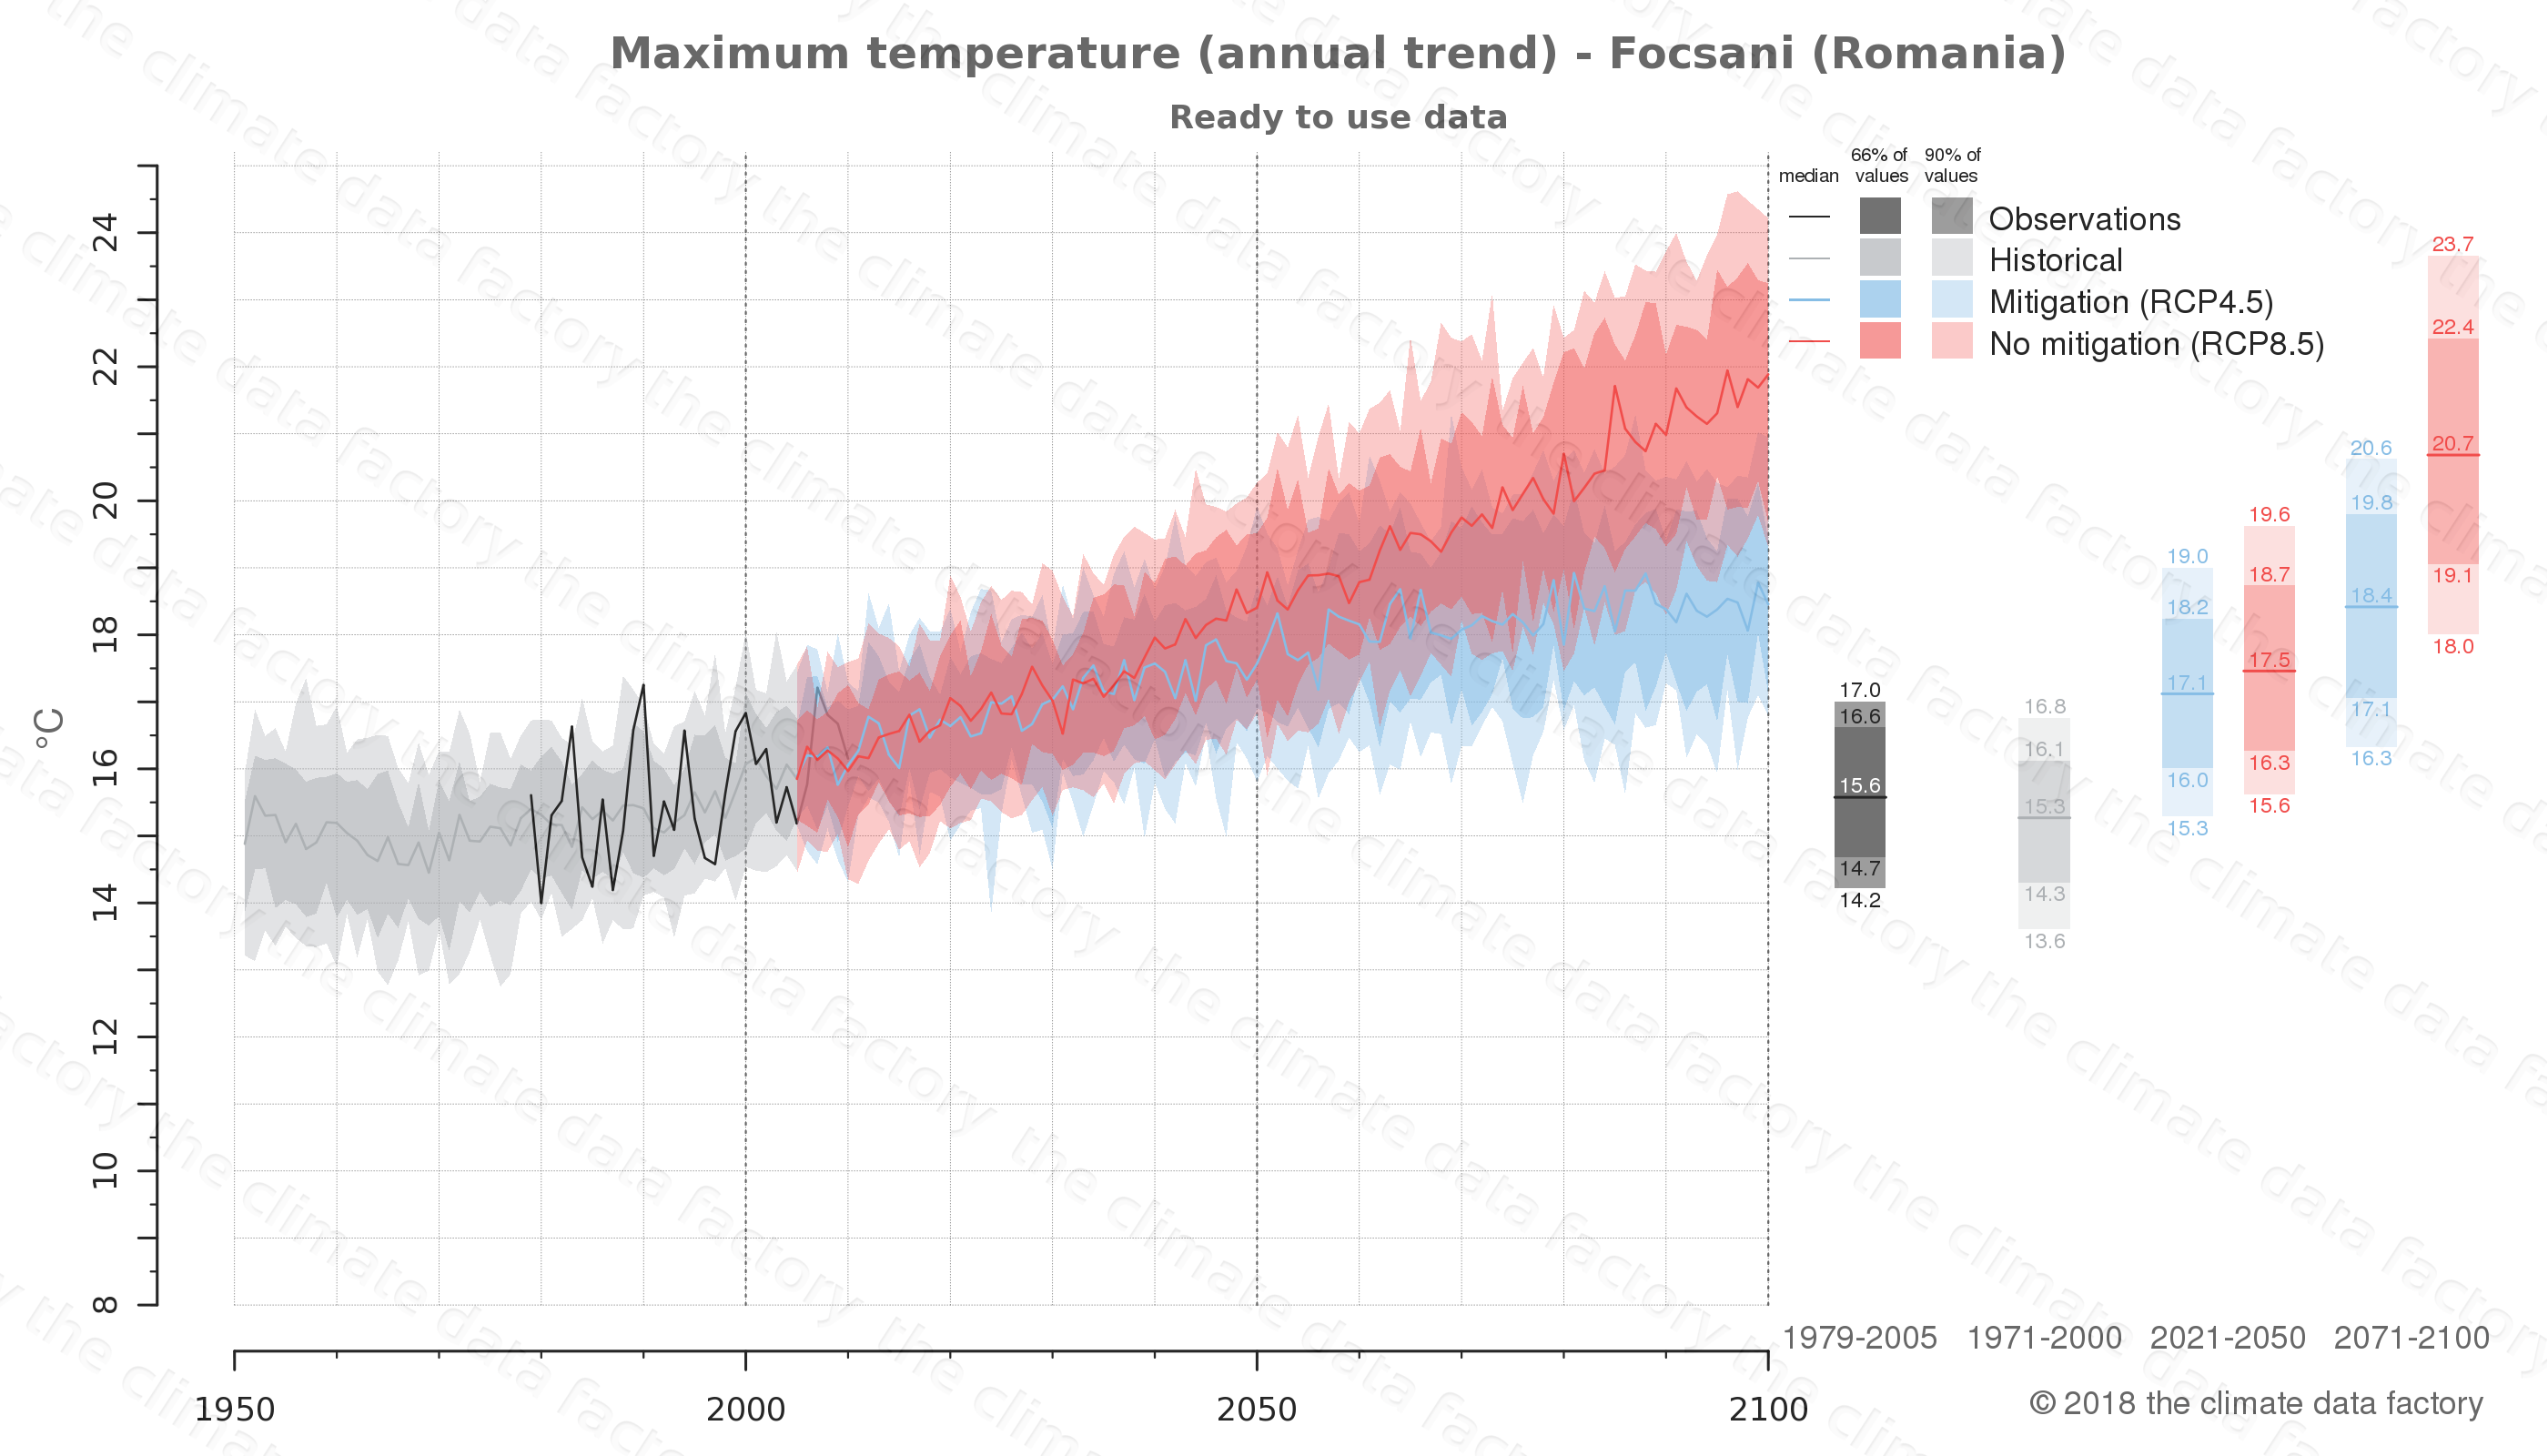 climate change data policy adaptation climate graph city data maximum-temperature focsani romania